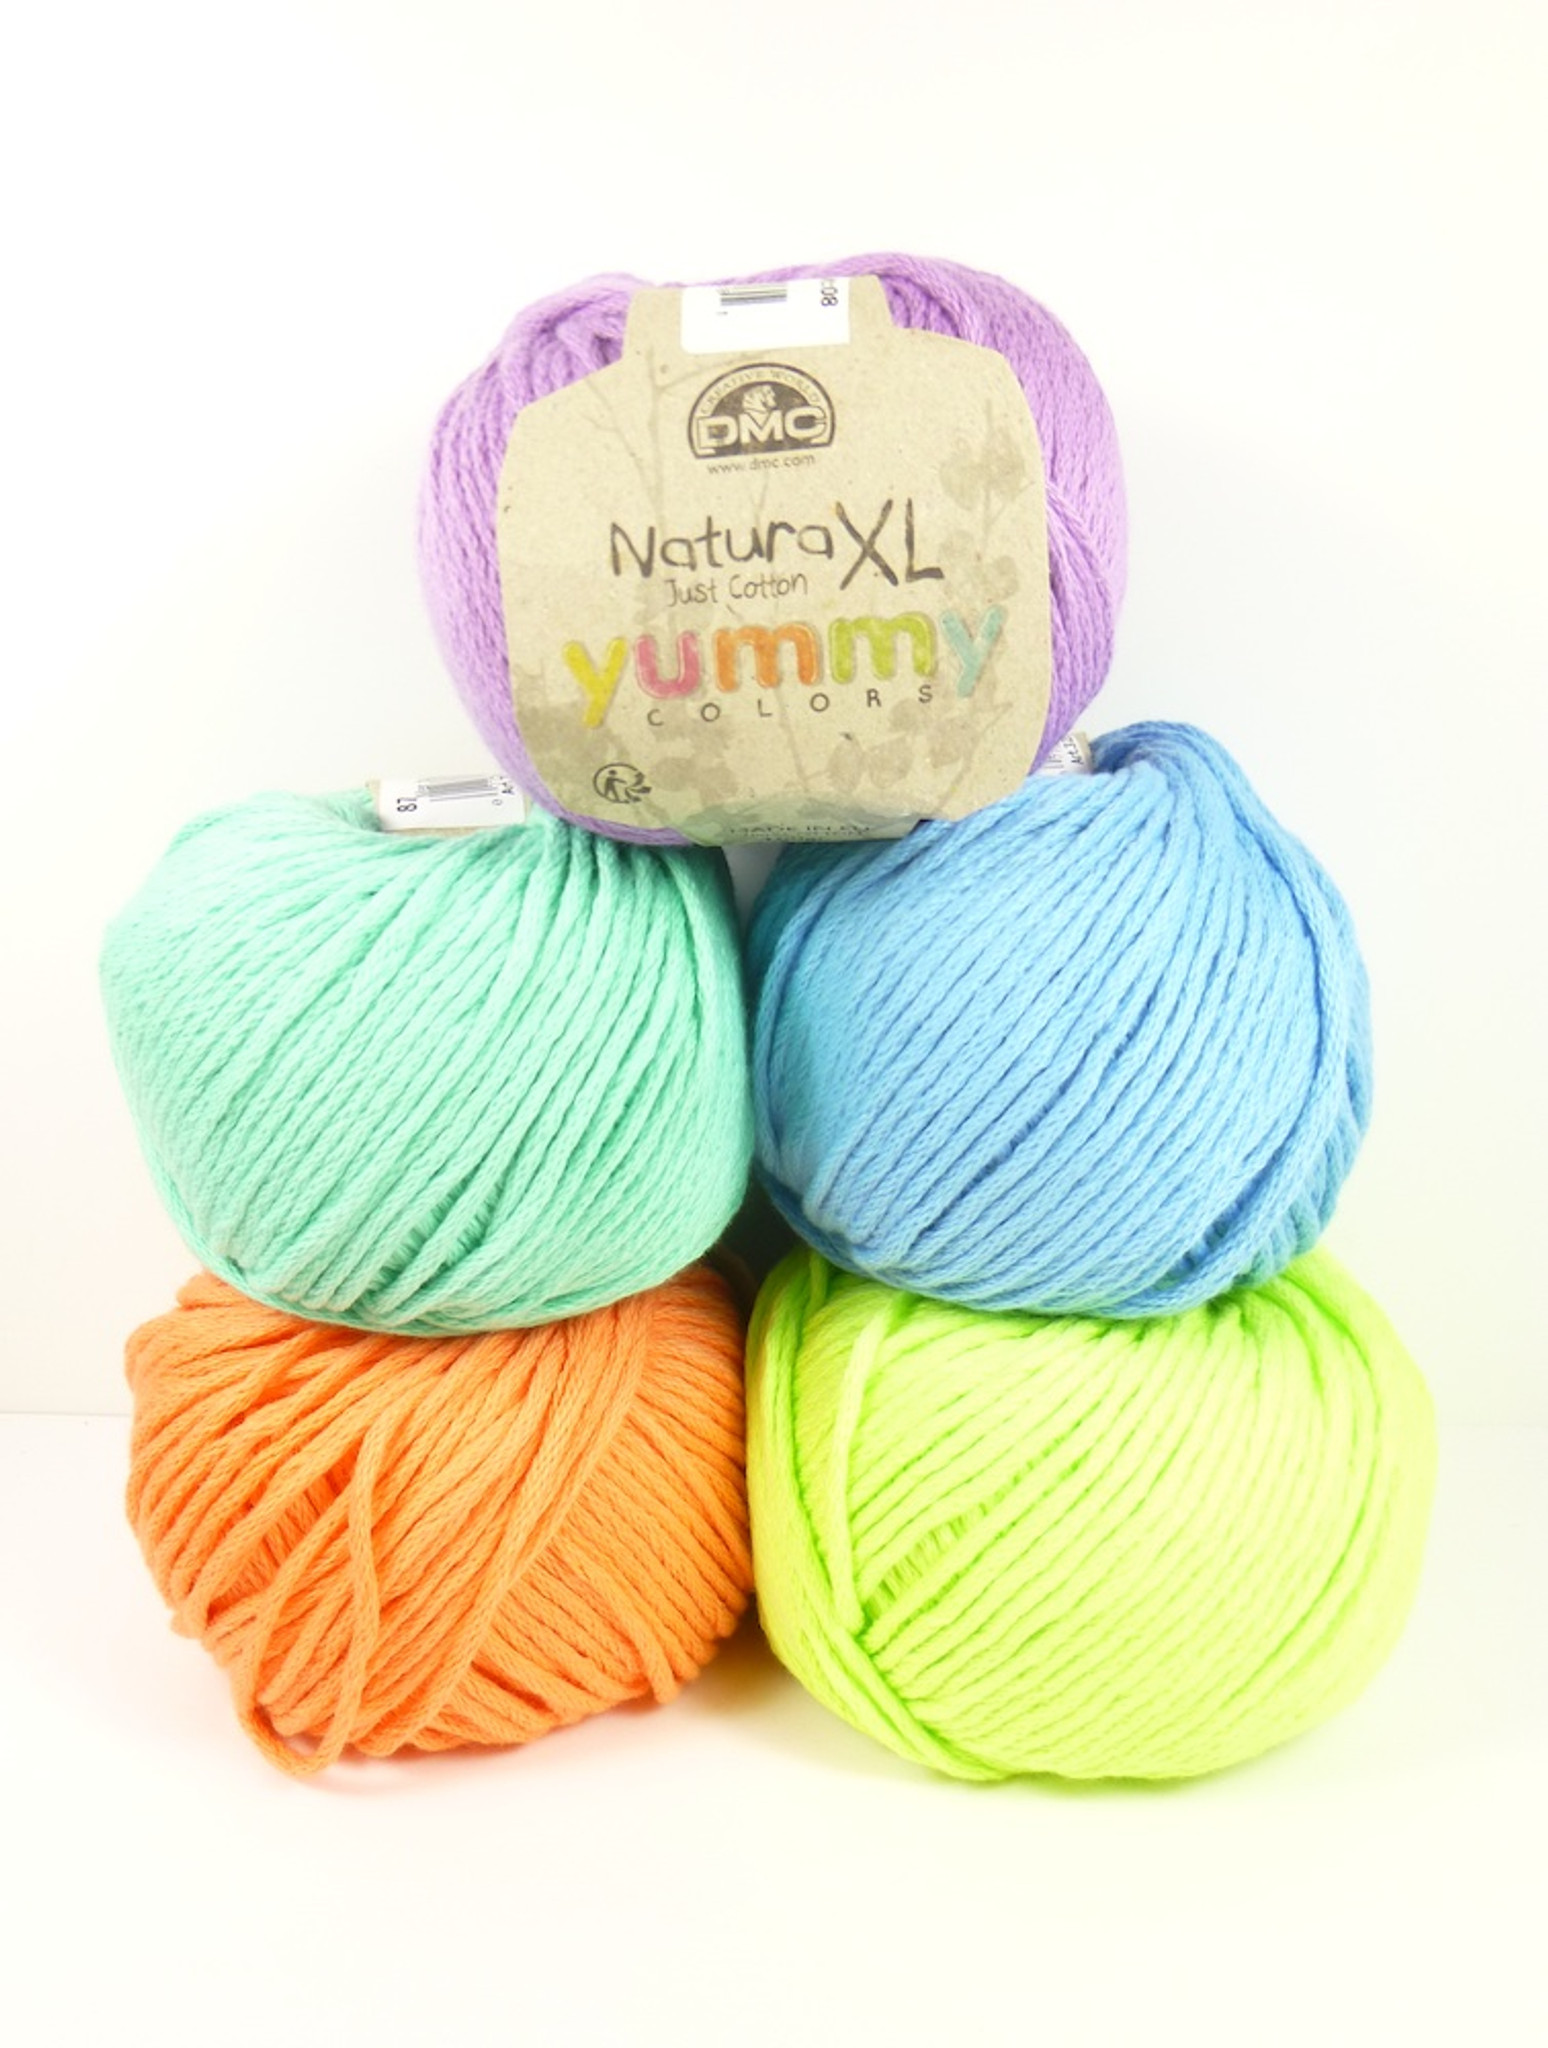 005 Red DMC Natura XL Just Cotton Crochet Knitting Yarn 100g